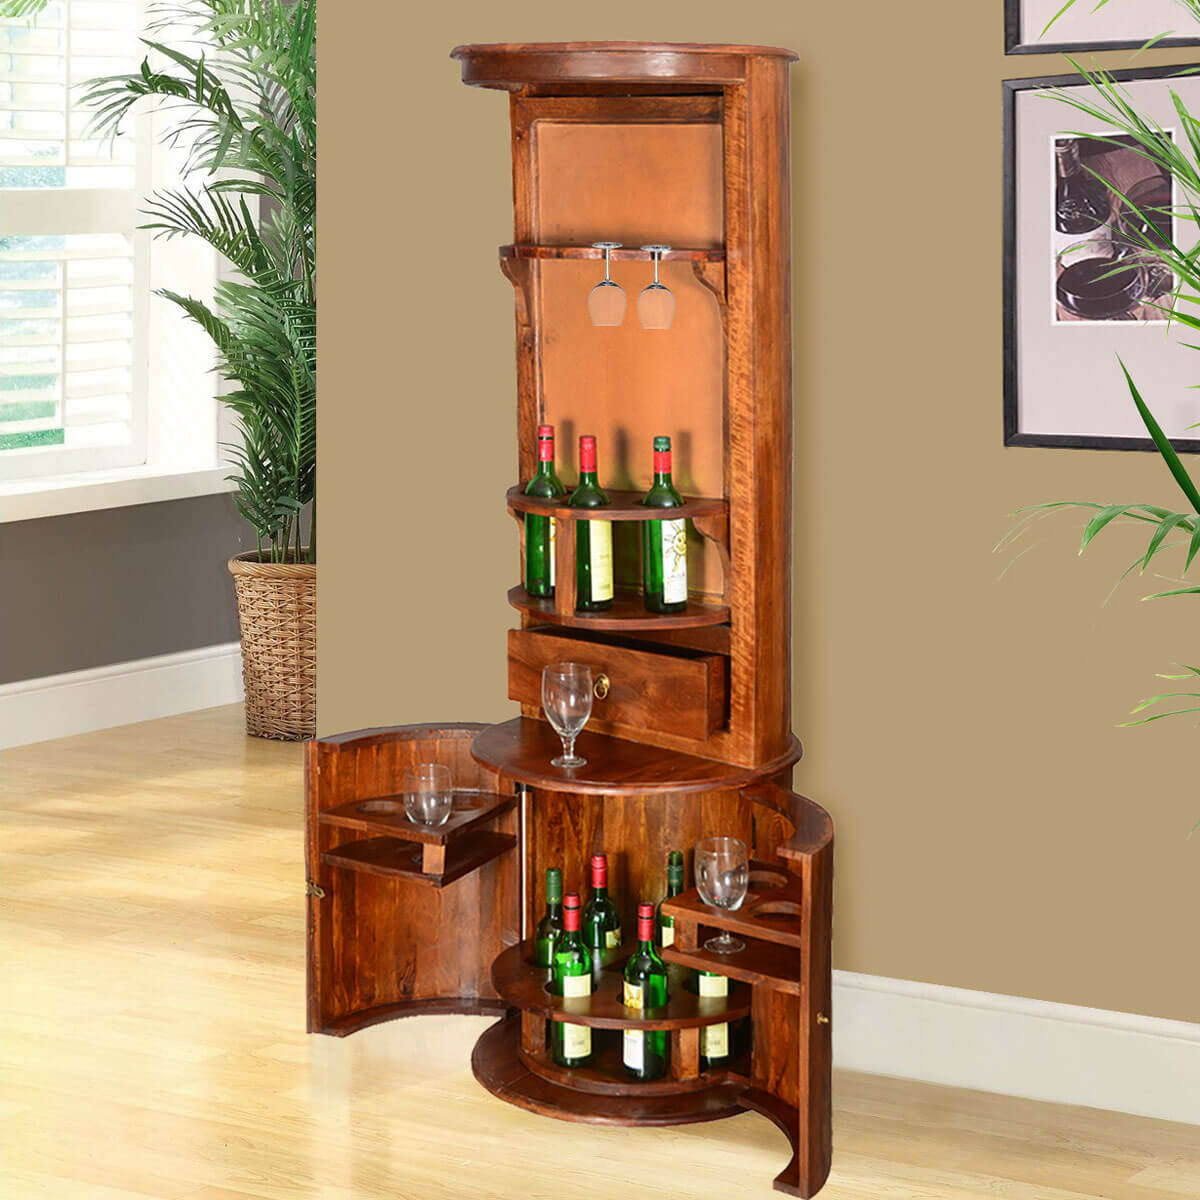 & Hebron Solid Wood Barrel Design Tower Bar Cabinet with Wine Storage